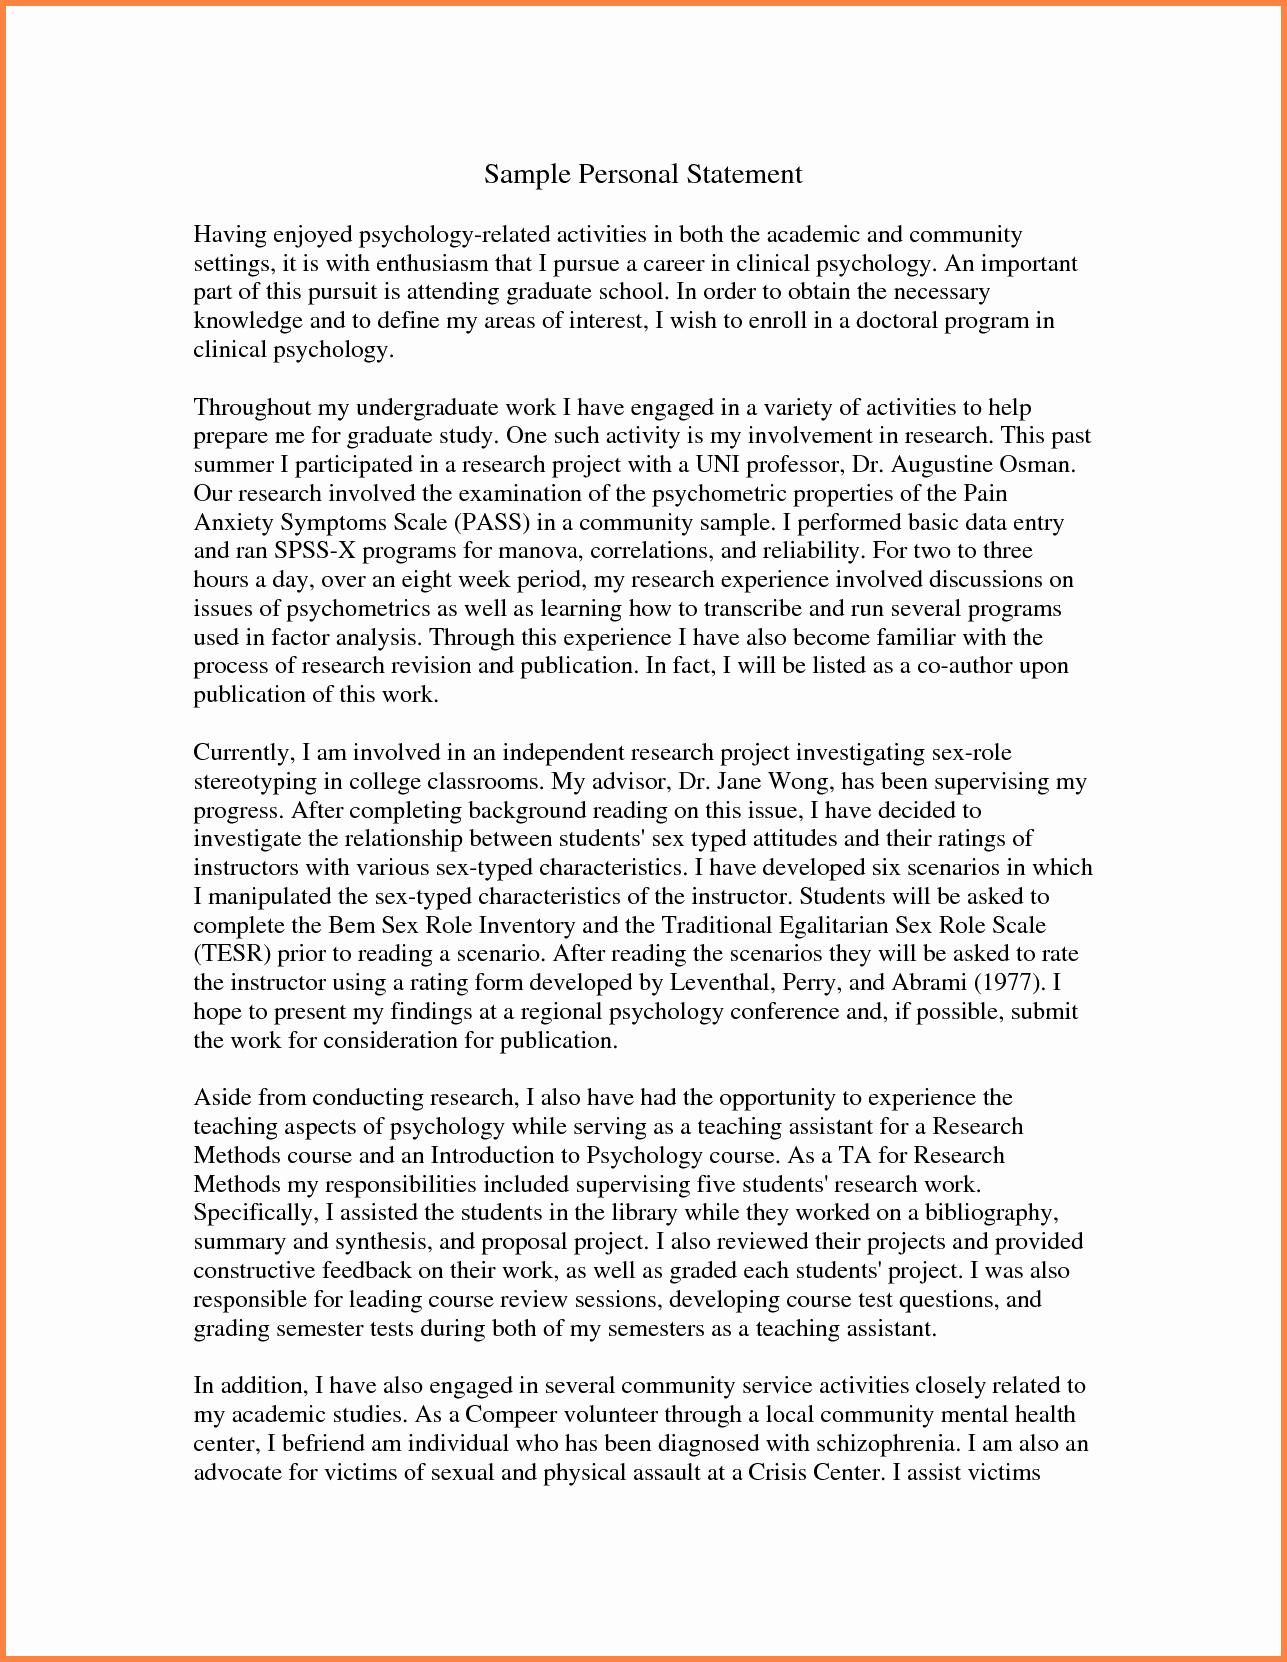 Personal Statement for Graduate School Sample Fresh Grad School Personal Statement Examples